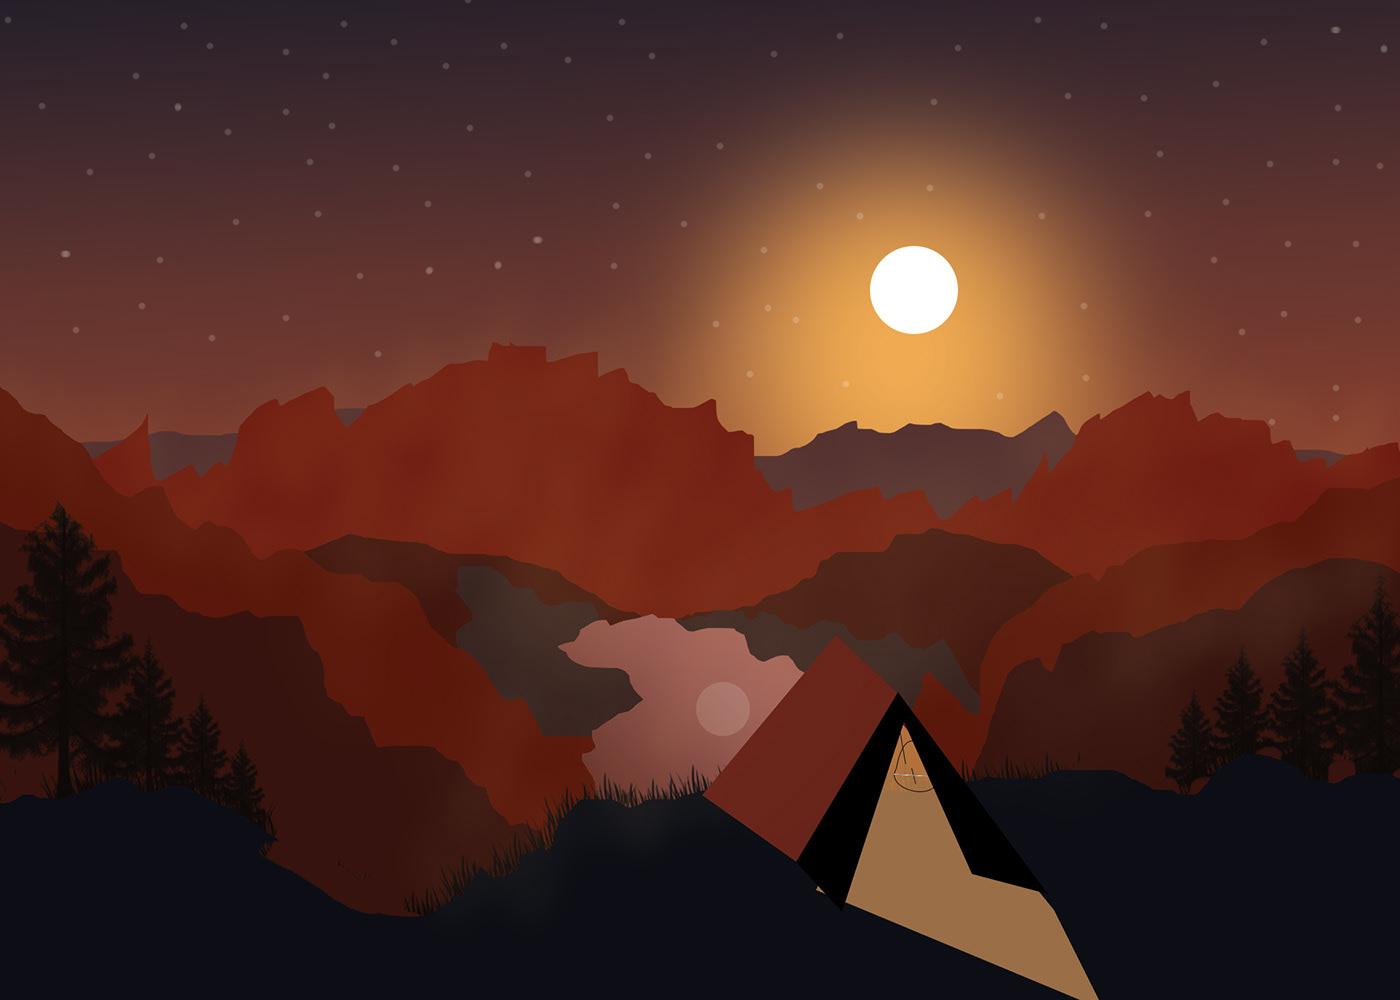 Image may contain: sunset, screenshot and moon